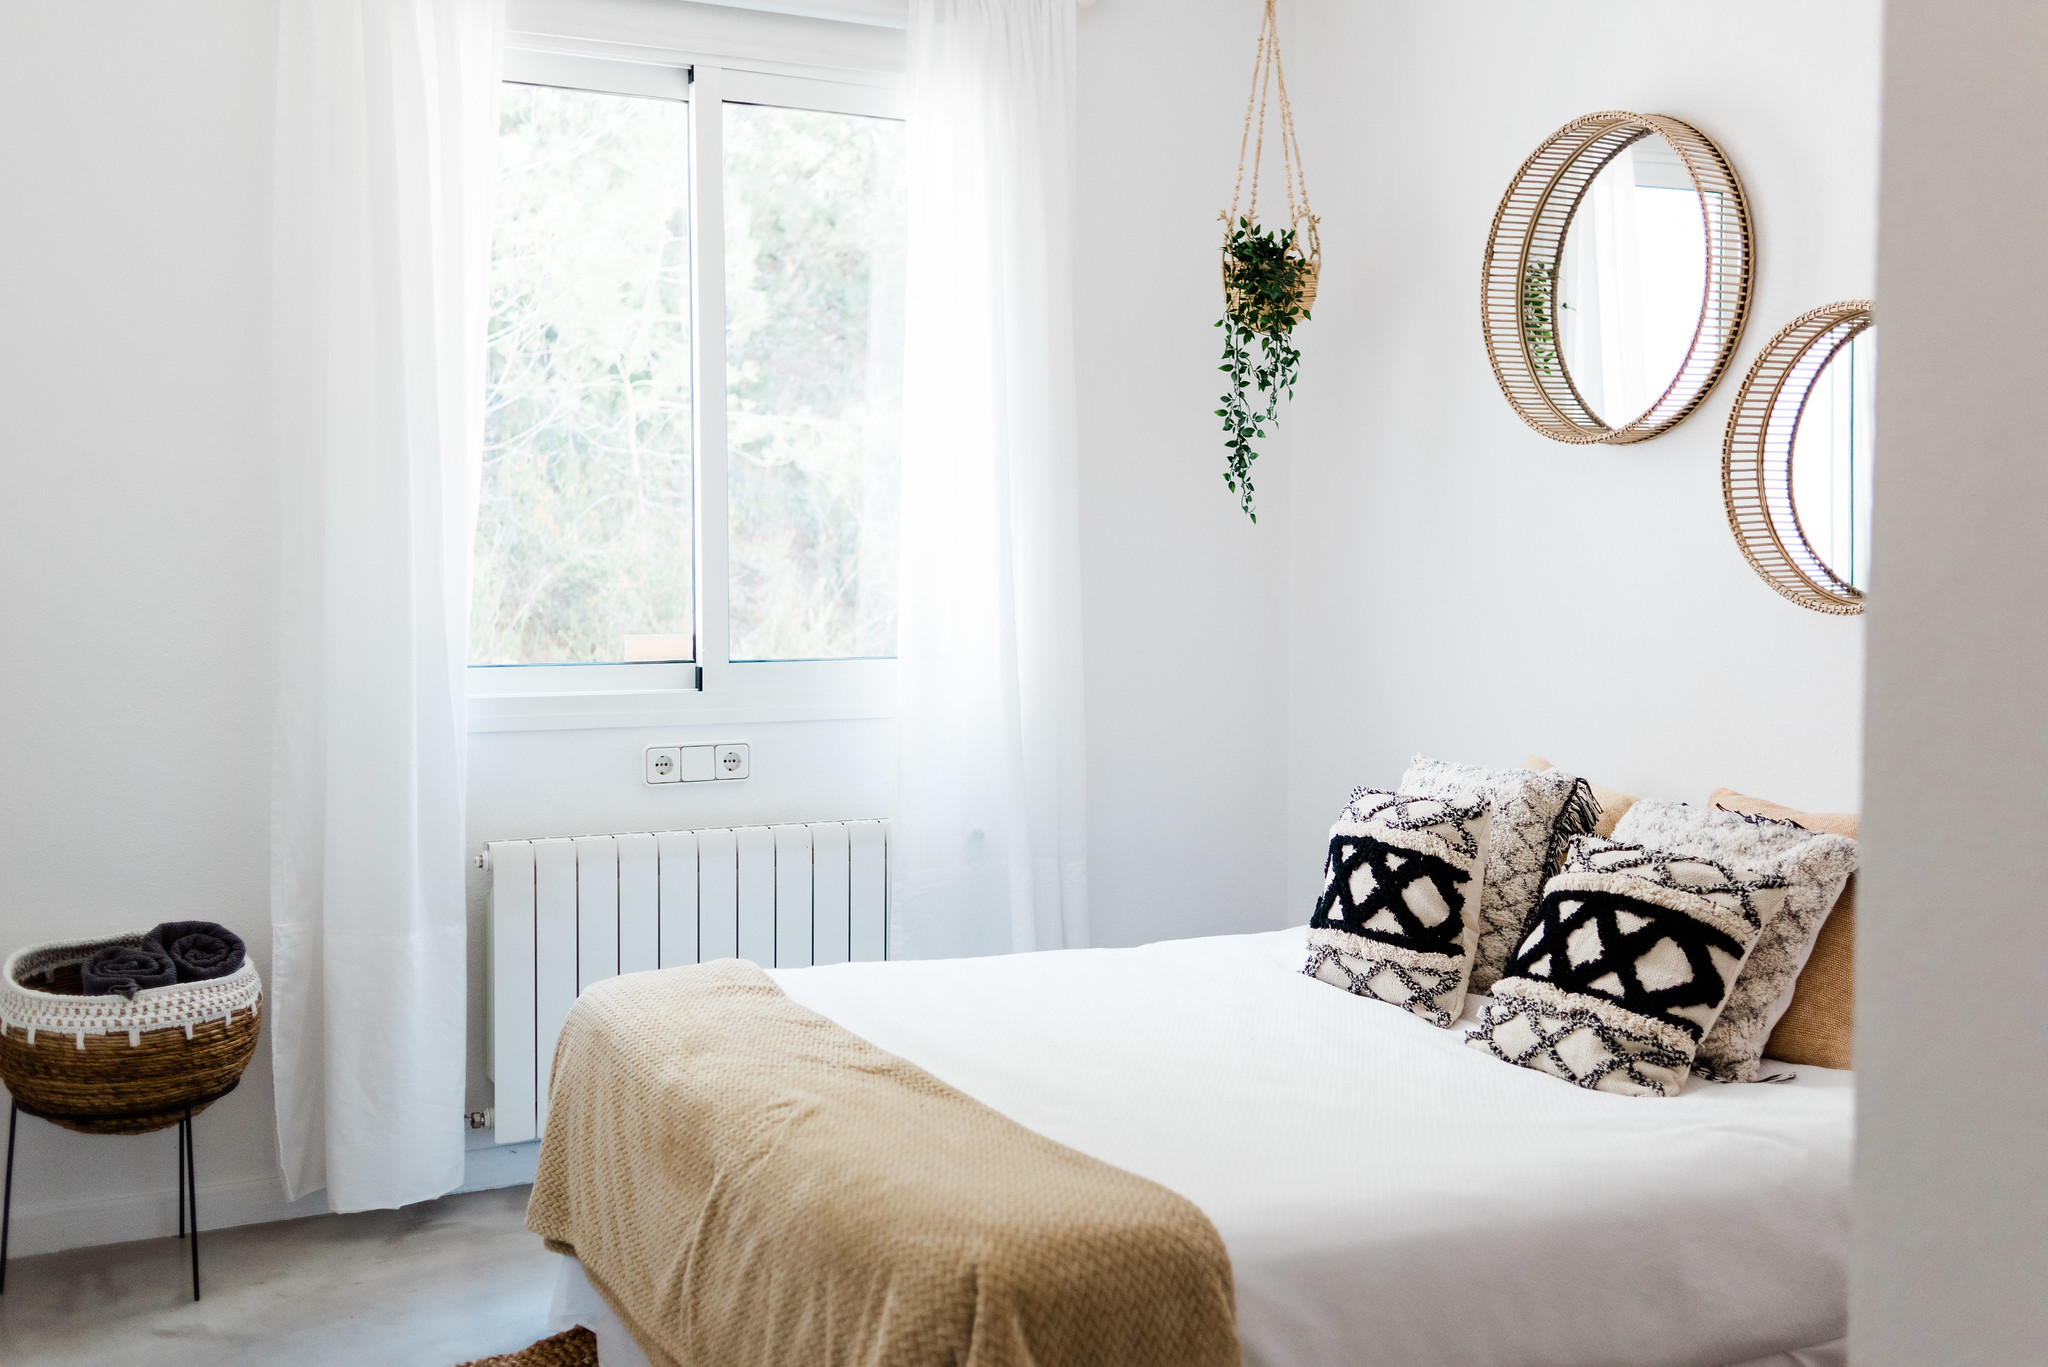 https://www.white-ibiza.com/wp-content/uploads/2020/05/white-ibiza-villas-can-verde-interior-bedroom.jpg